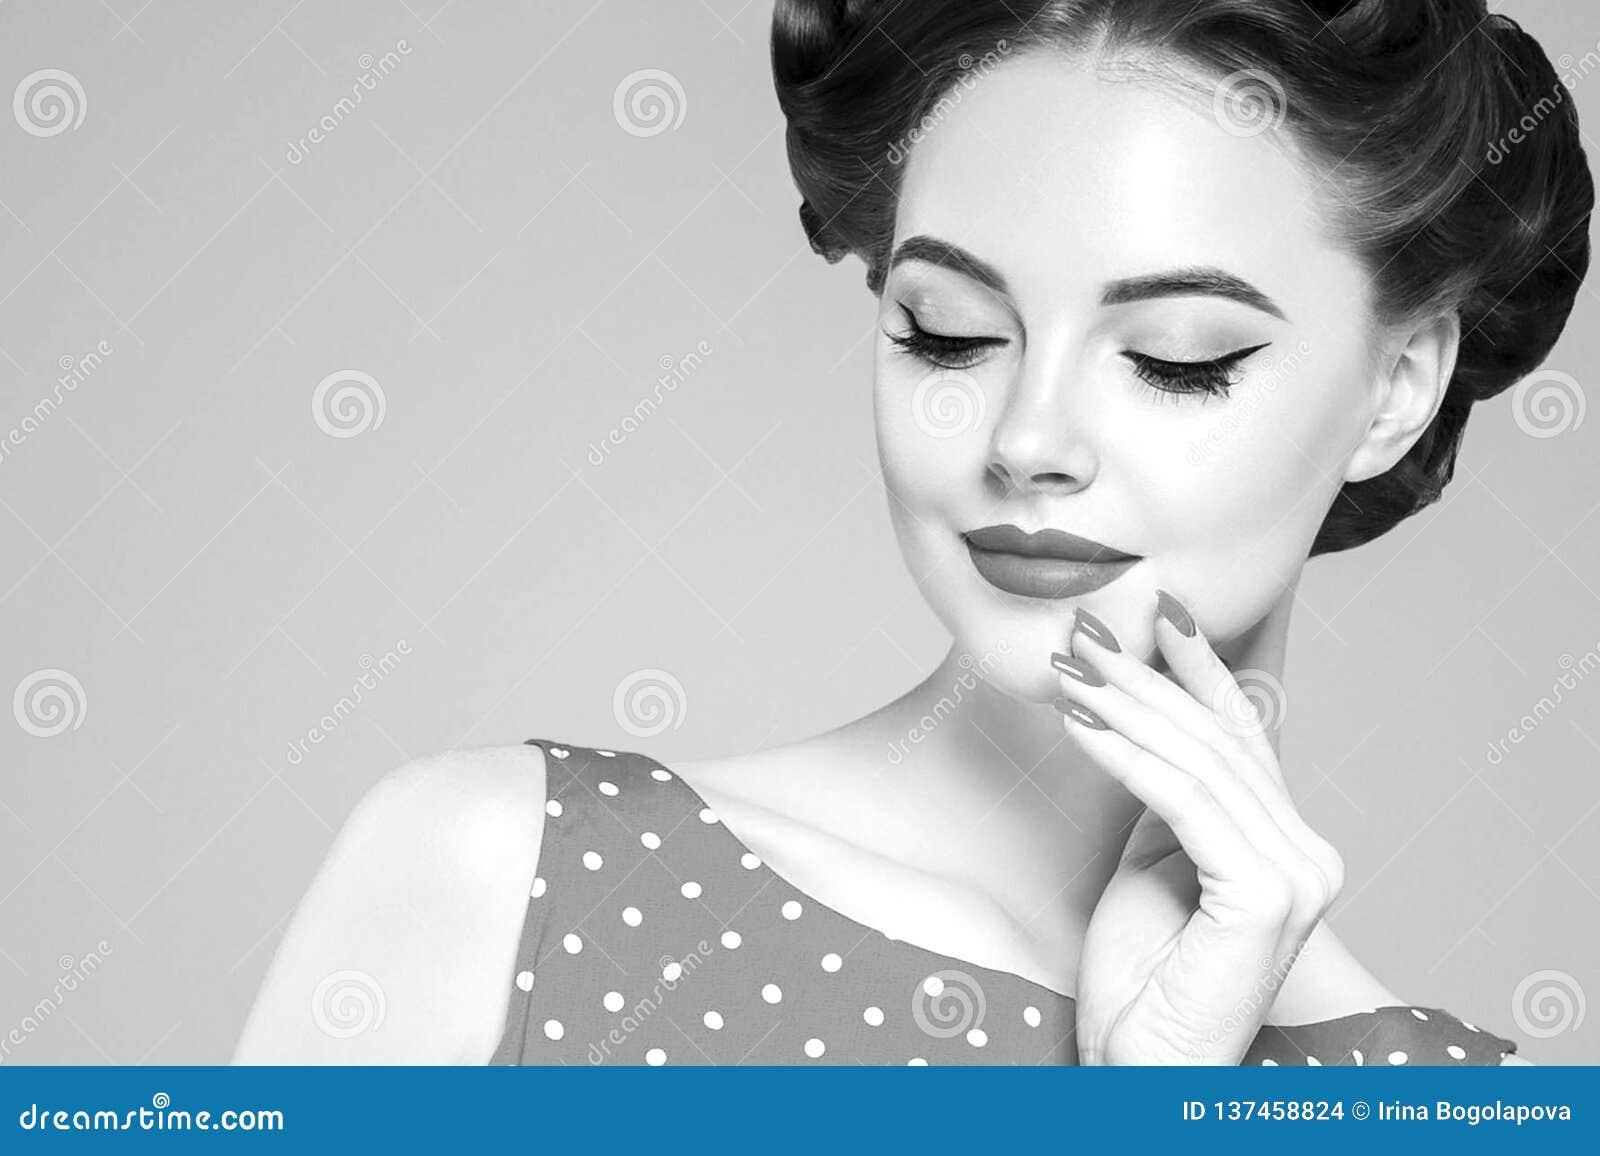 Retro. Portrait Of Pensive Pinup Girl Dreaming Stock Photo